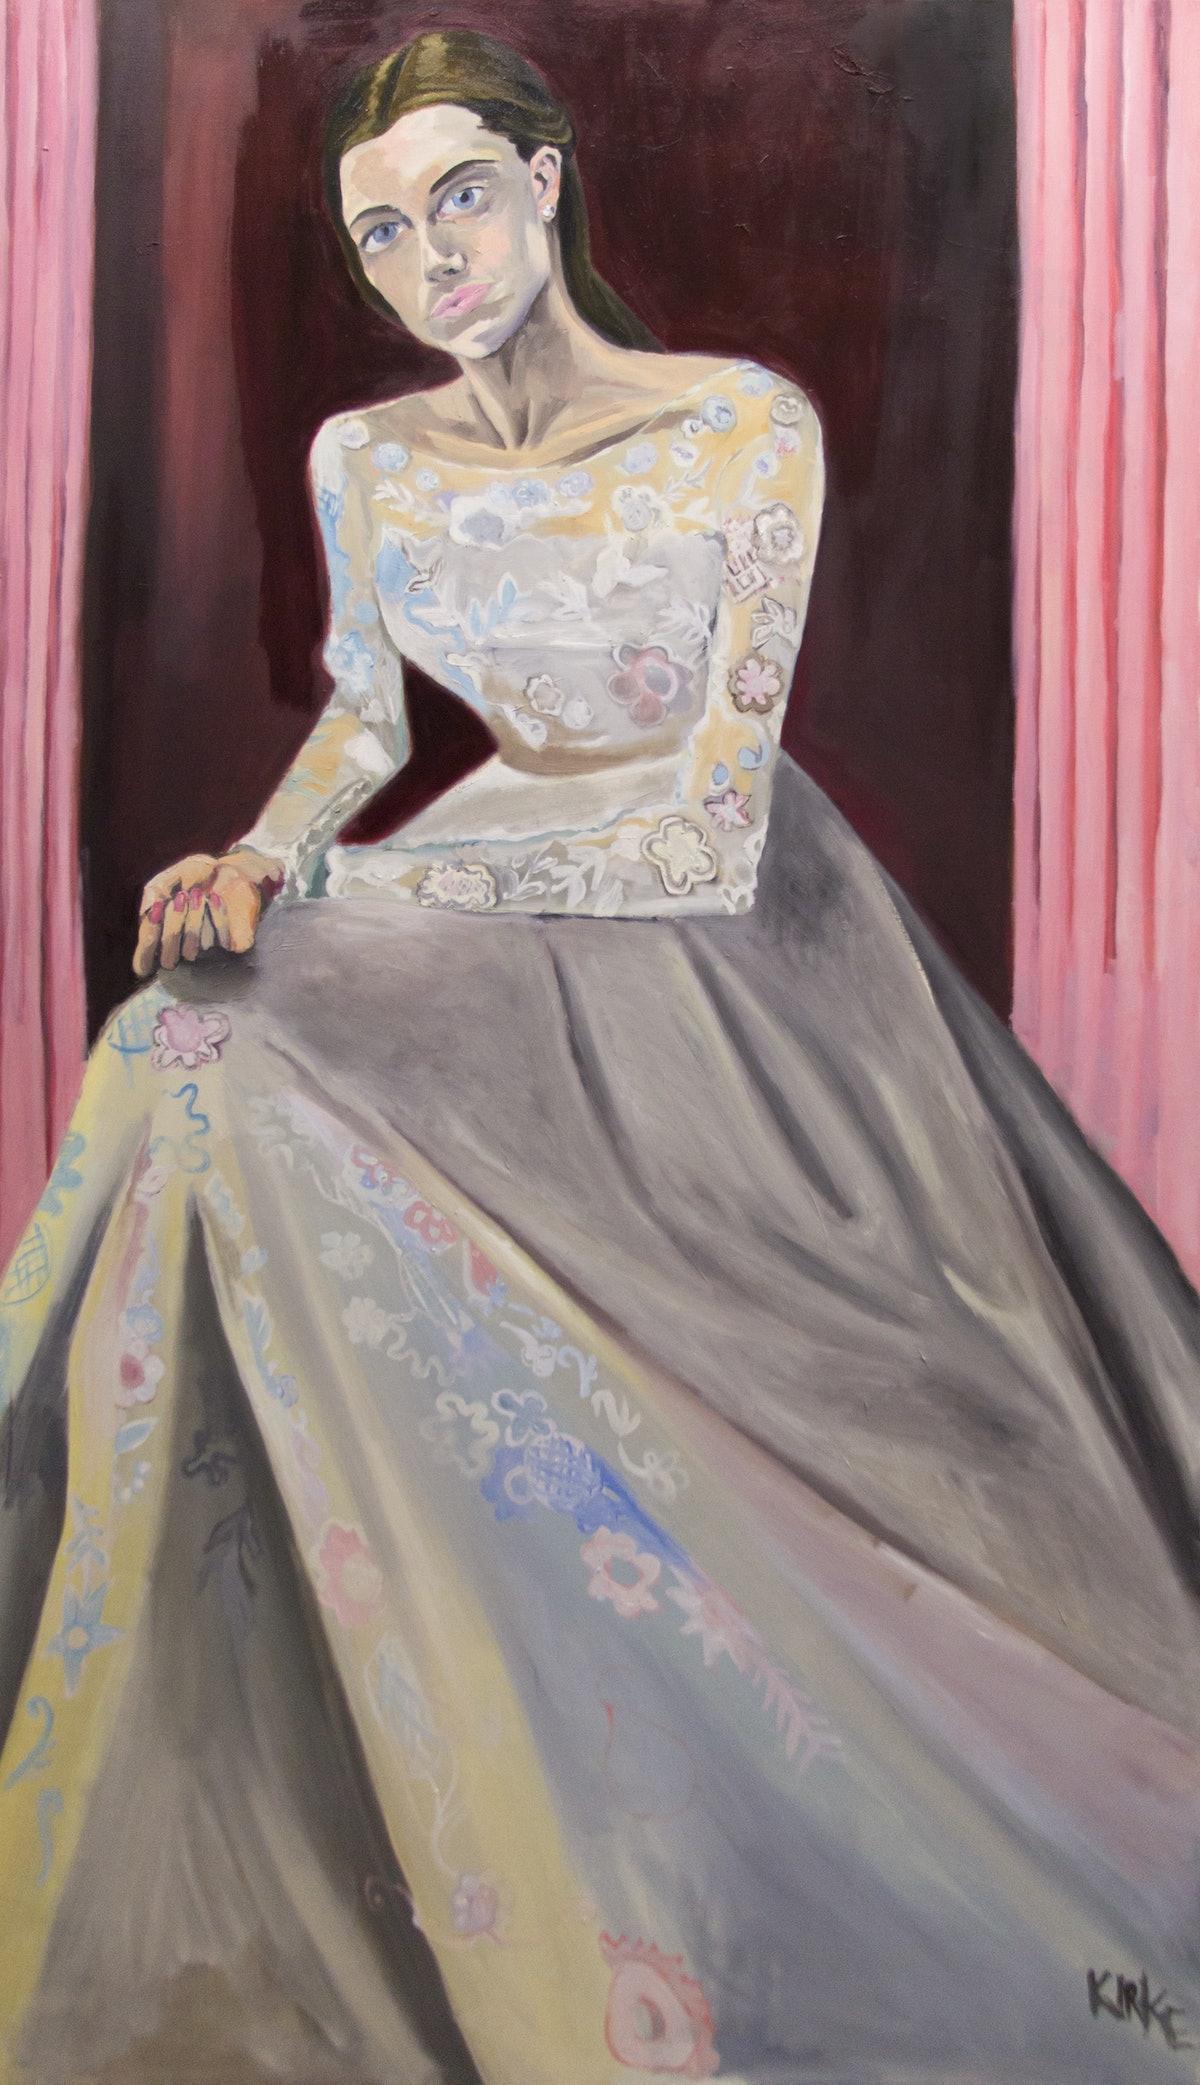 Kirke, Jemima, Allison in Her Wedding Dress, 2017, Oil on canvas, 68 x 40 inches.jpg